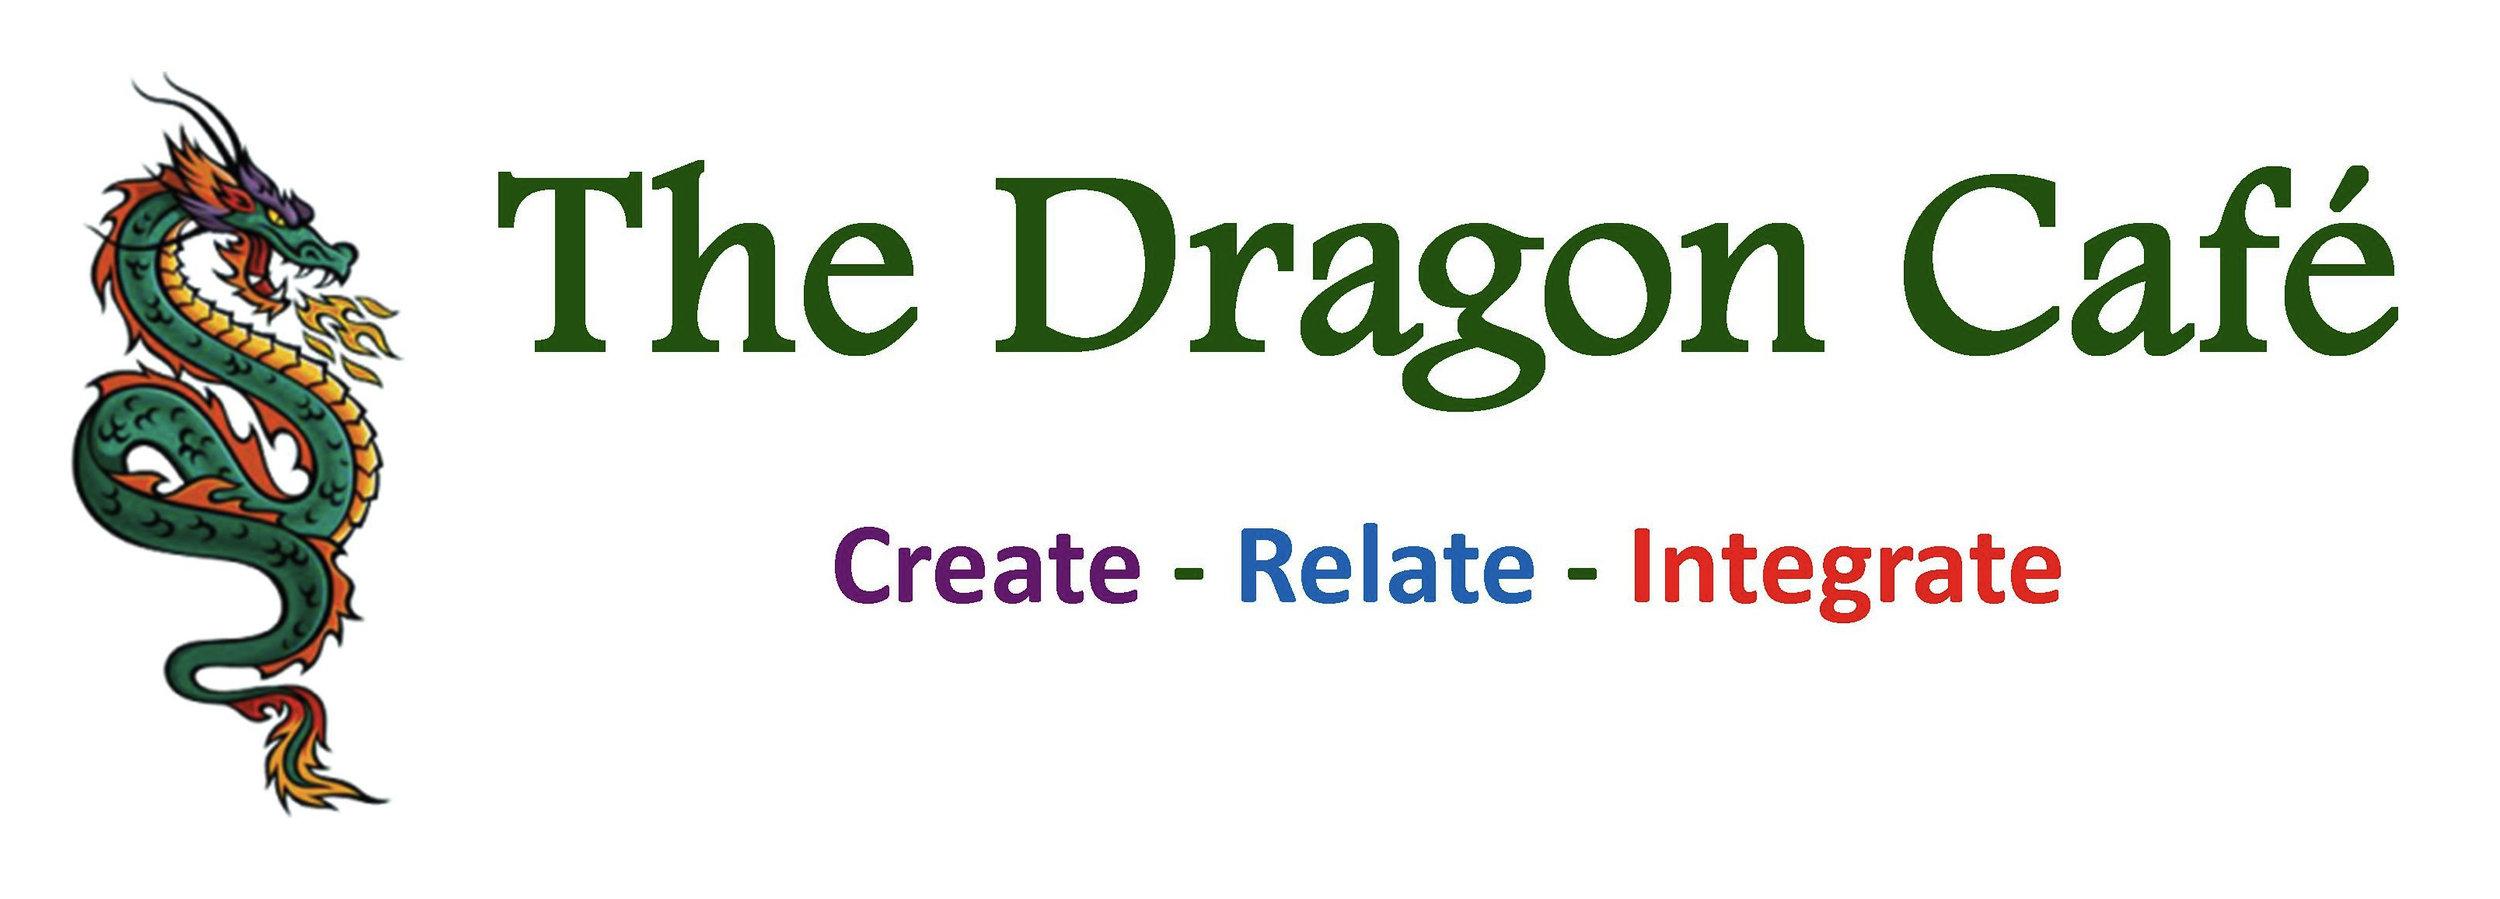 dragon-cafe-logo.jpg